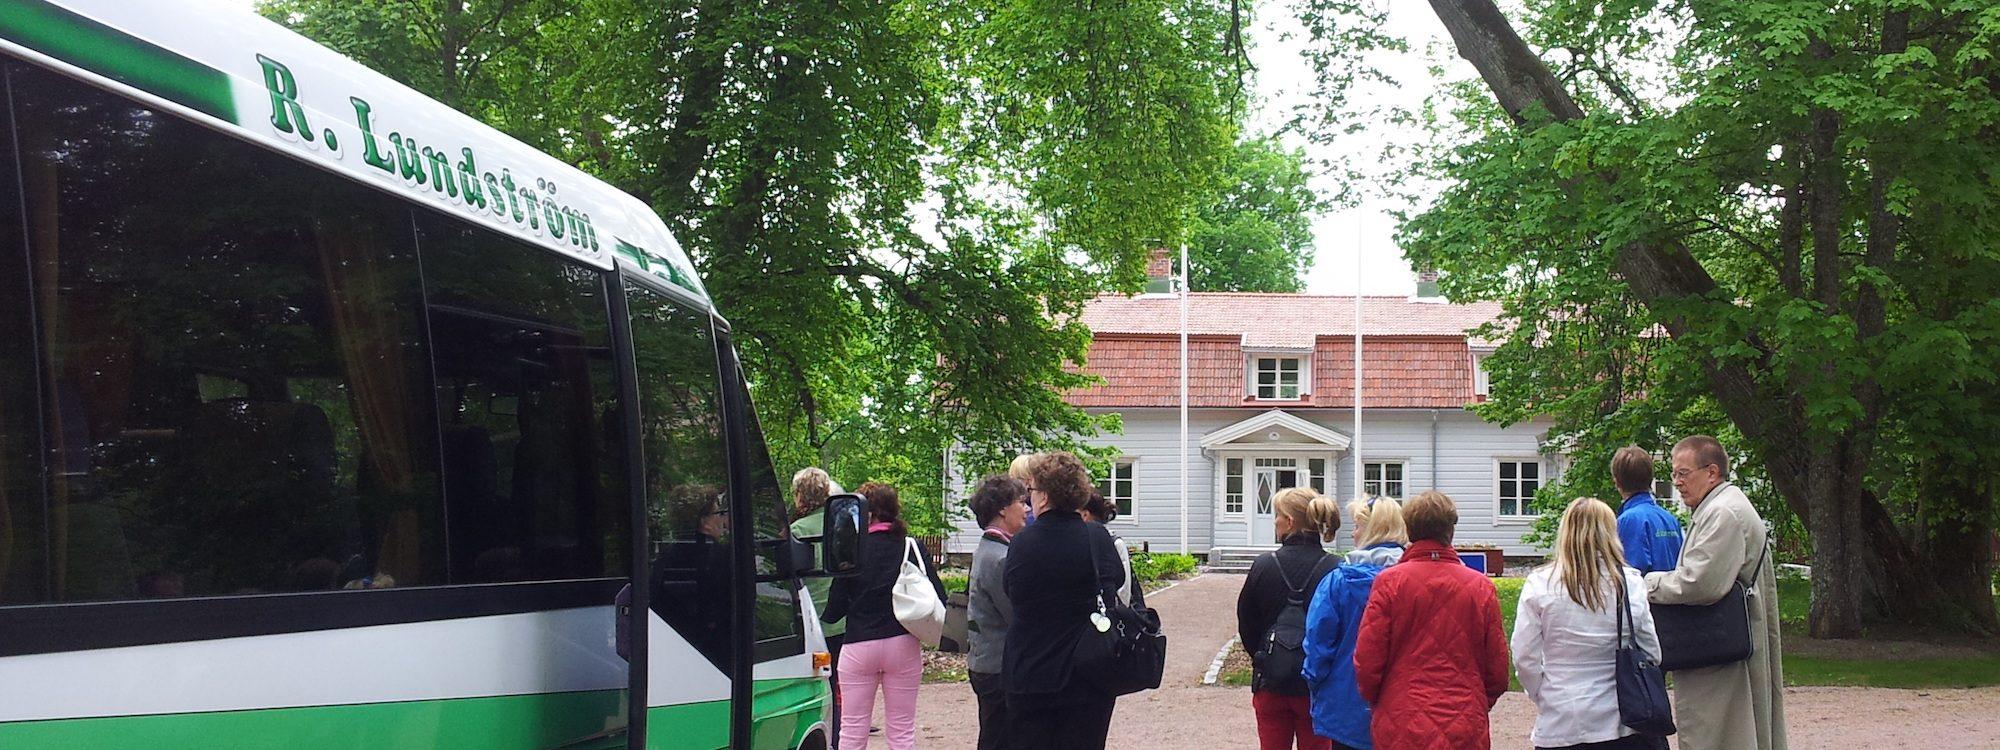 Porkkalan parenteesi Charterbus R Lundström